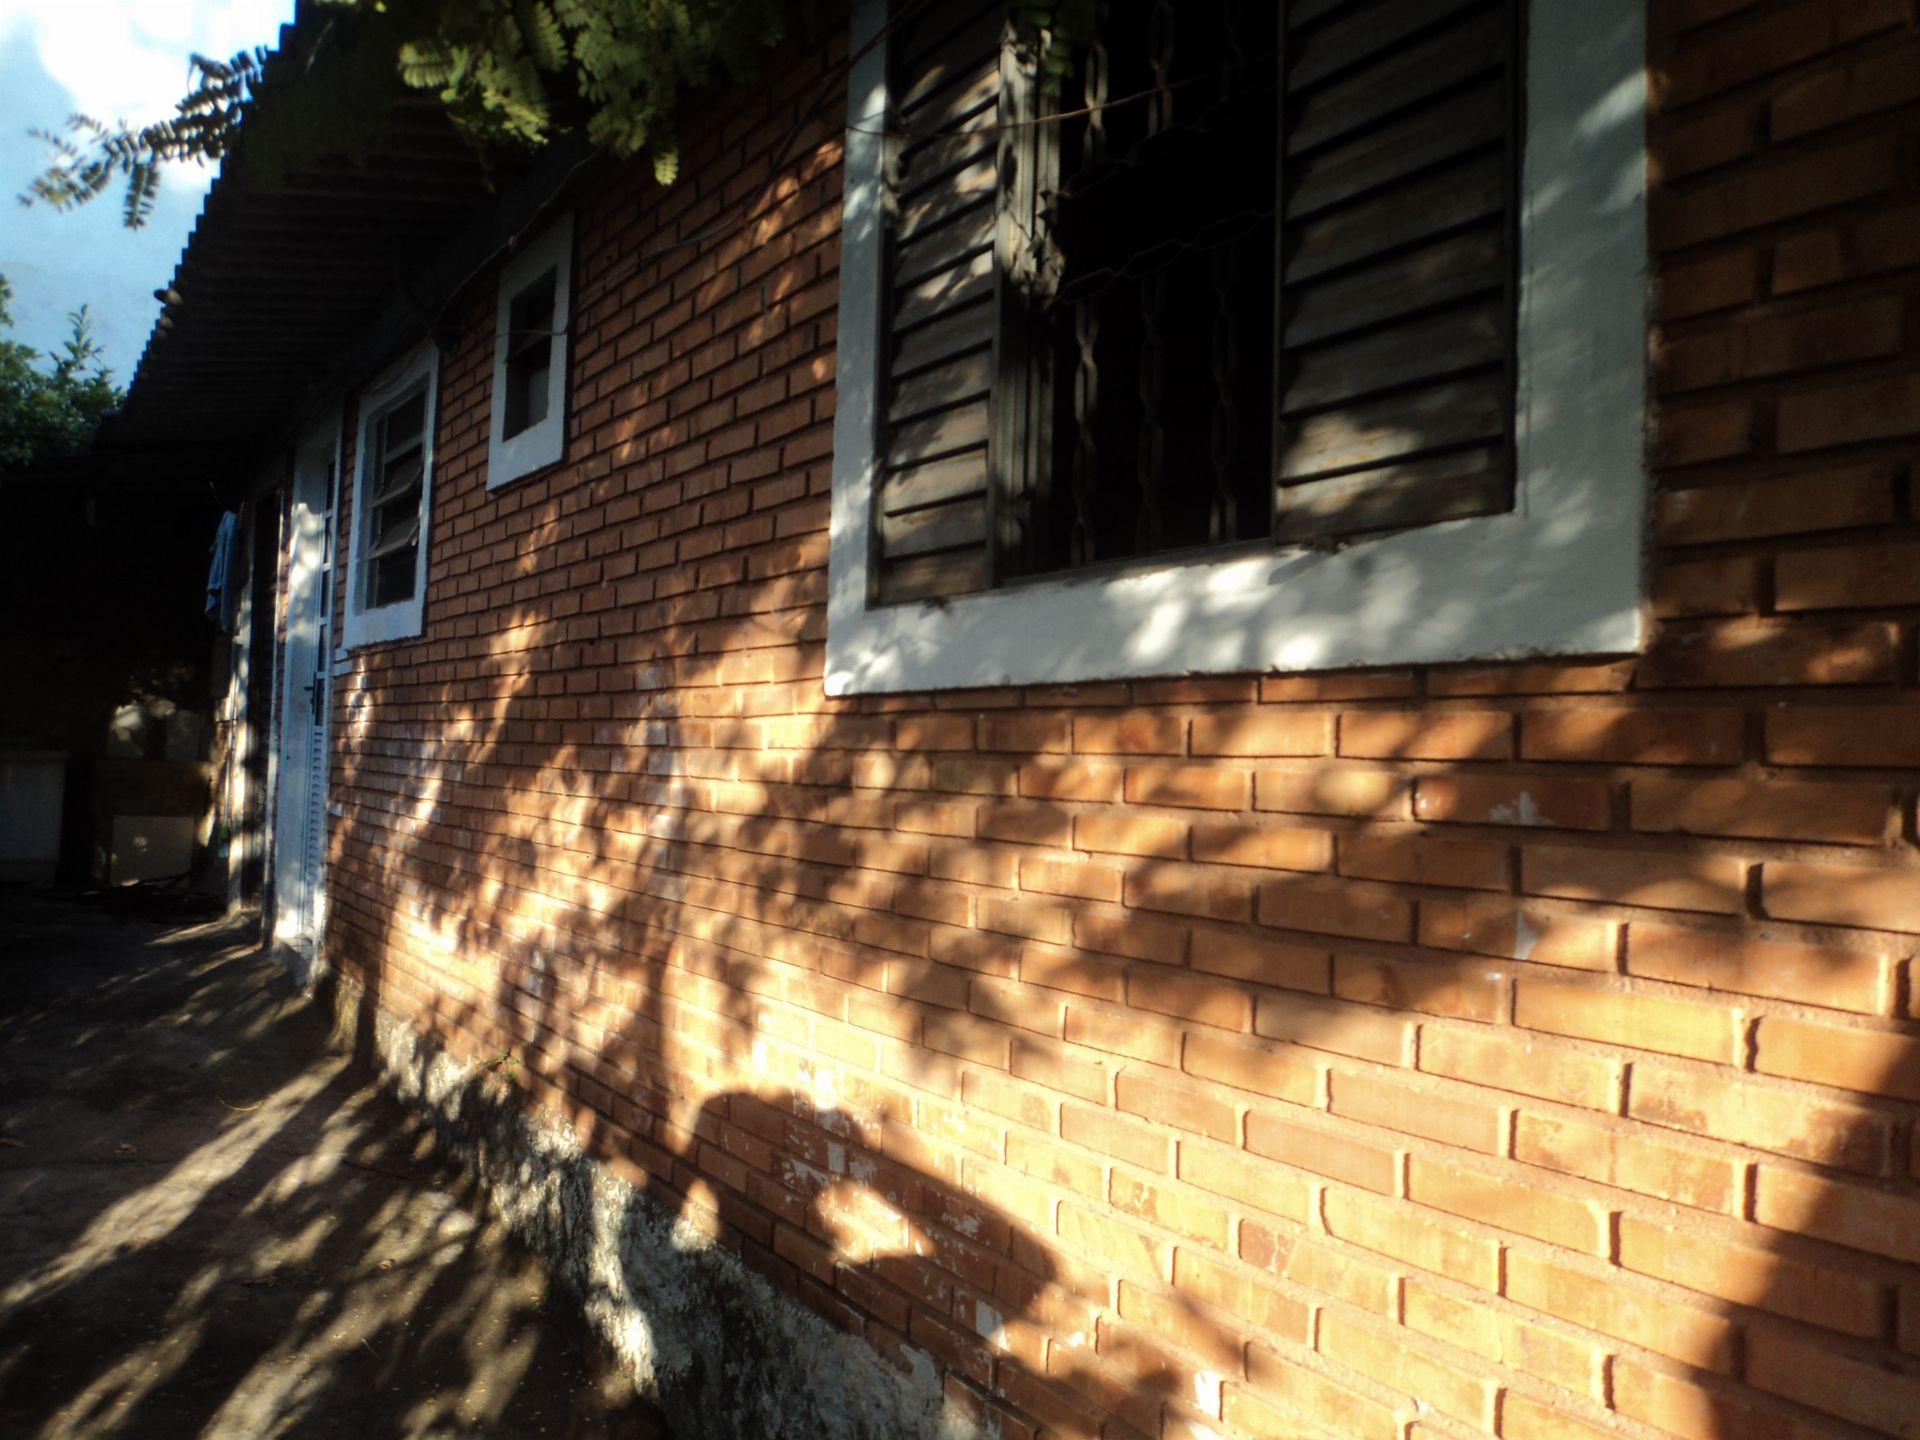 Chácara à venda Vila Nova, PICADÃO,São Pedro - R$ 470.000 - CH088 - 15